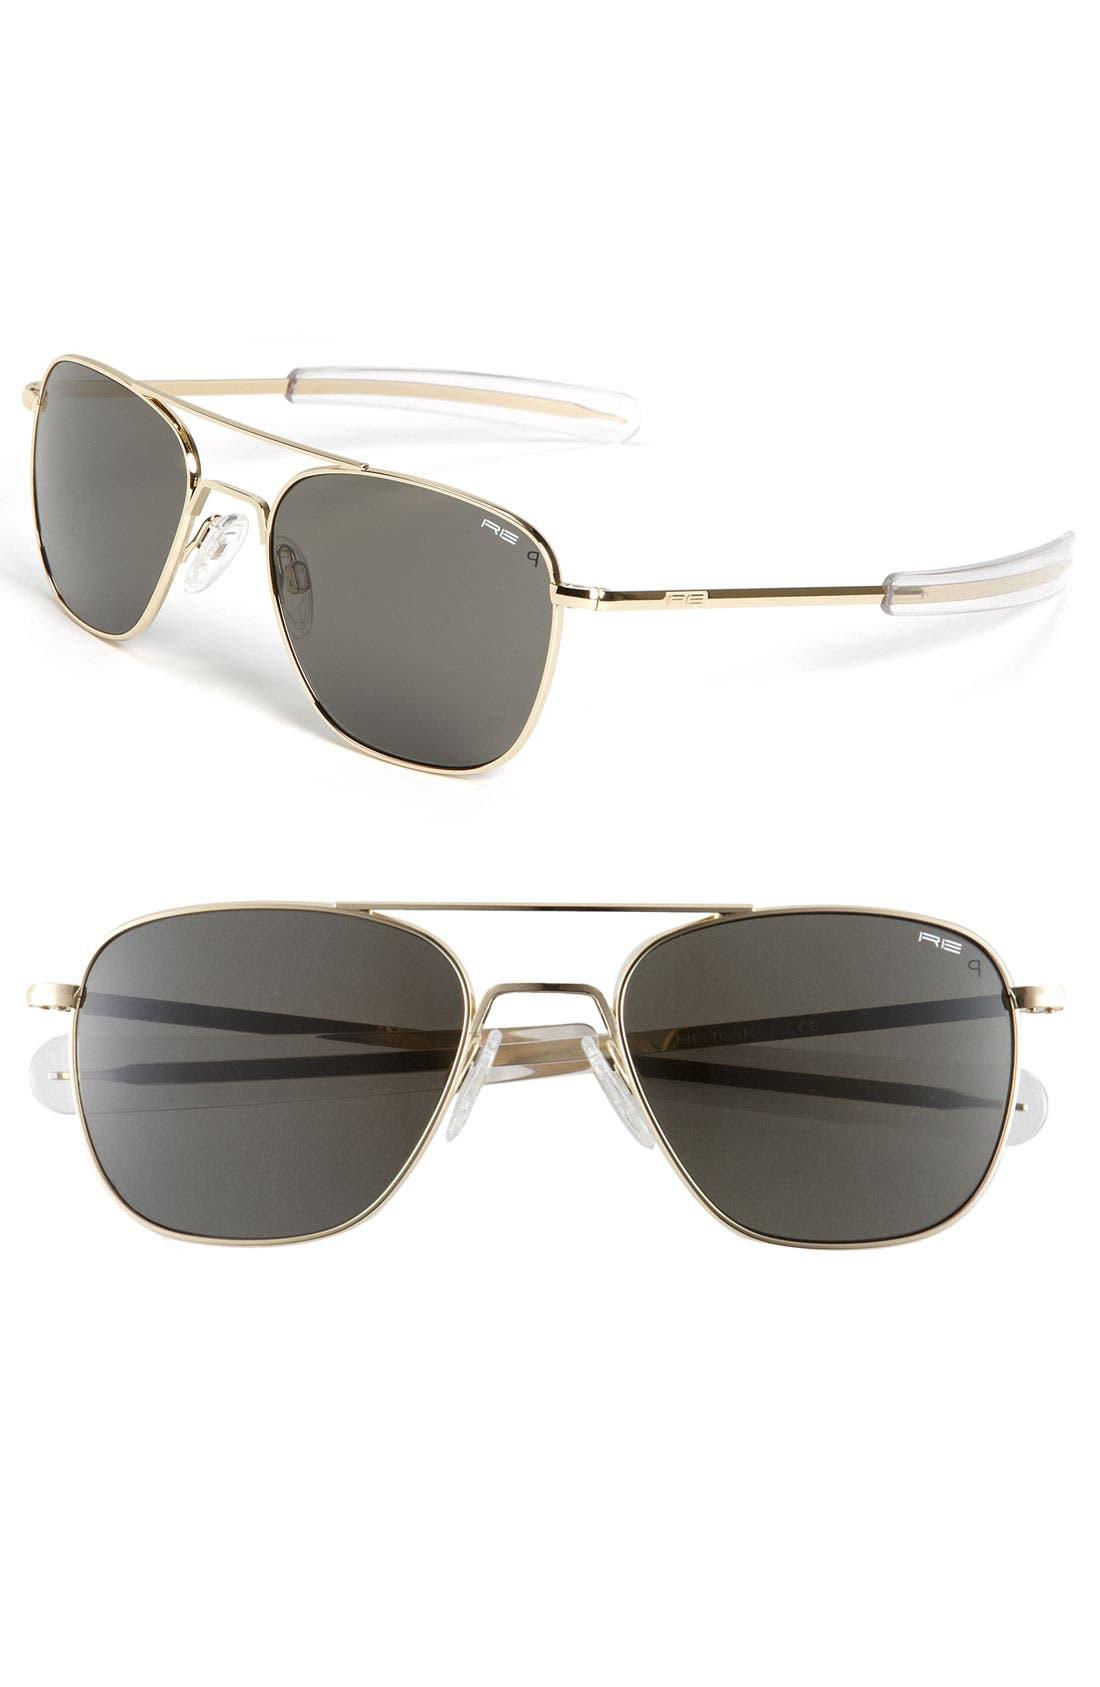 55mm Aviator Sunglasses,                         Main,                         color, Gold